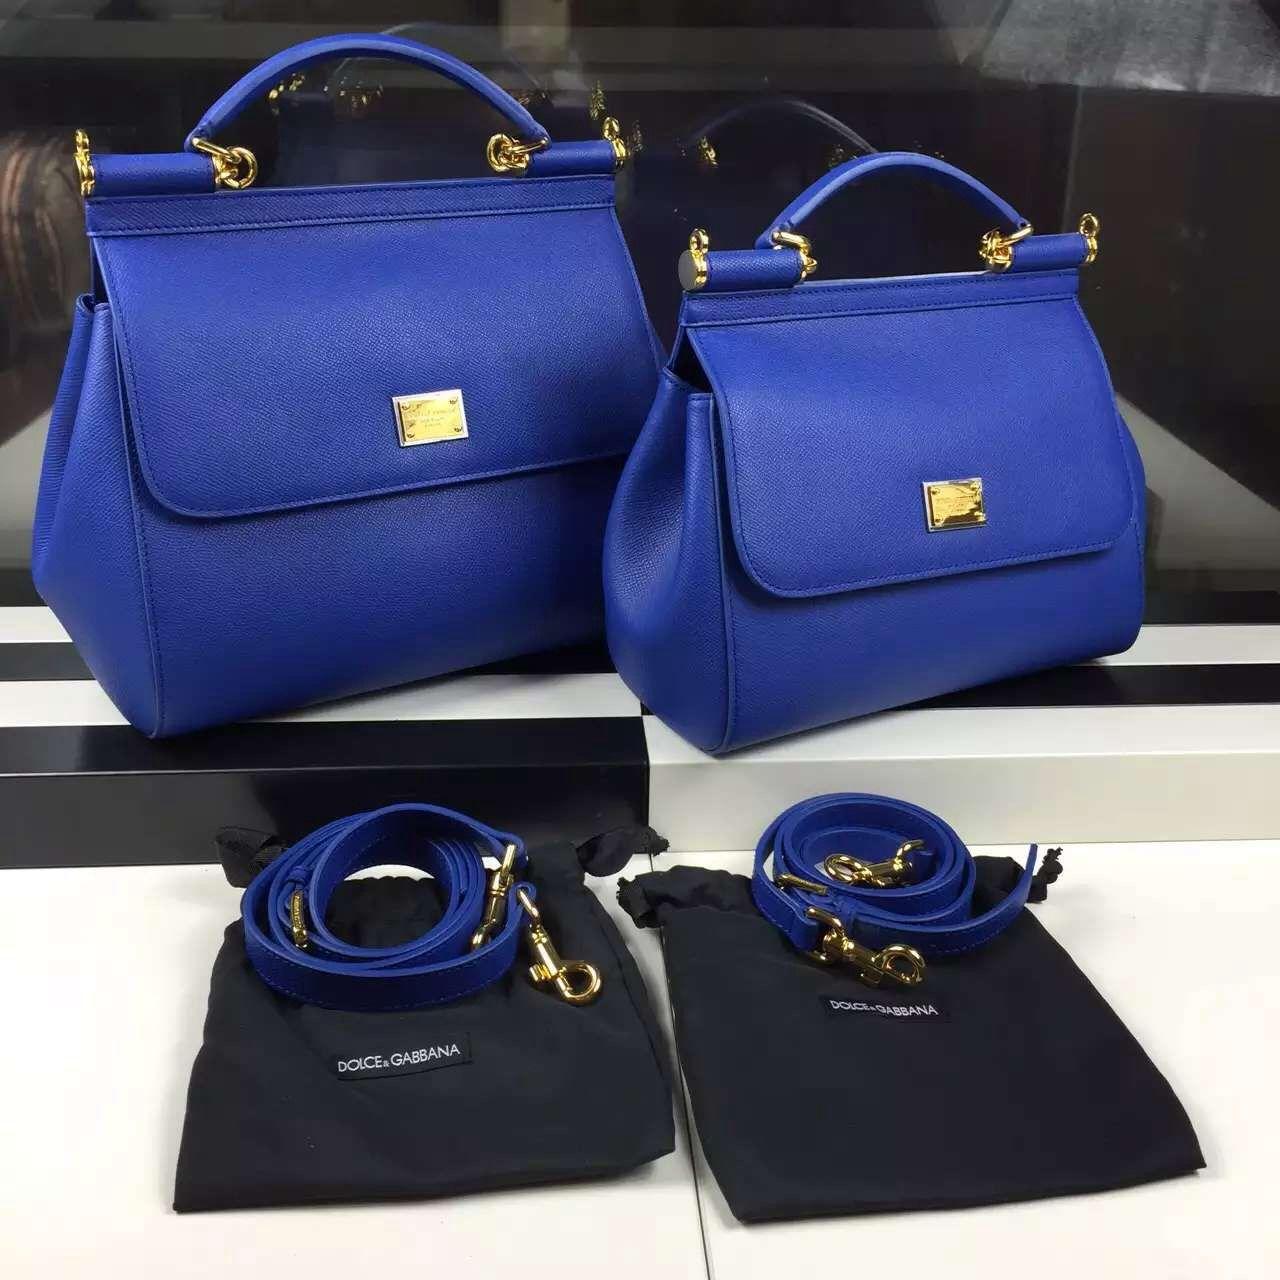 2c42a8f78f45 Dolce   Gabbana Small Medium Epsom Calfskin Sicily Bag Royal Blue ...